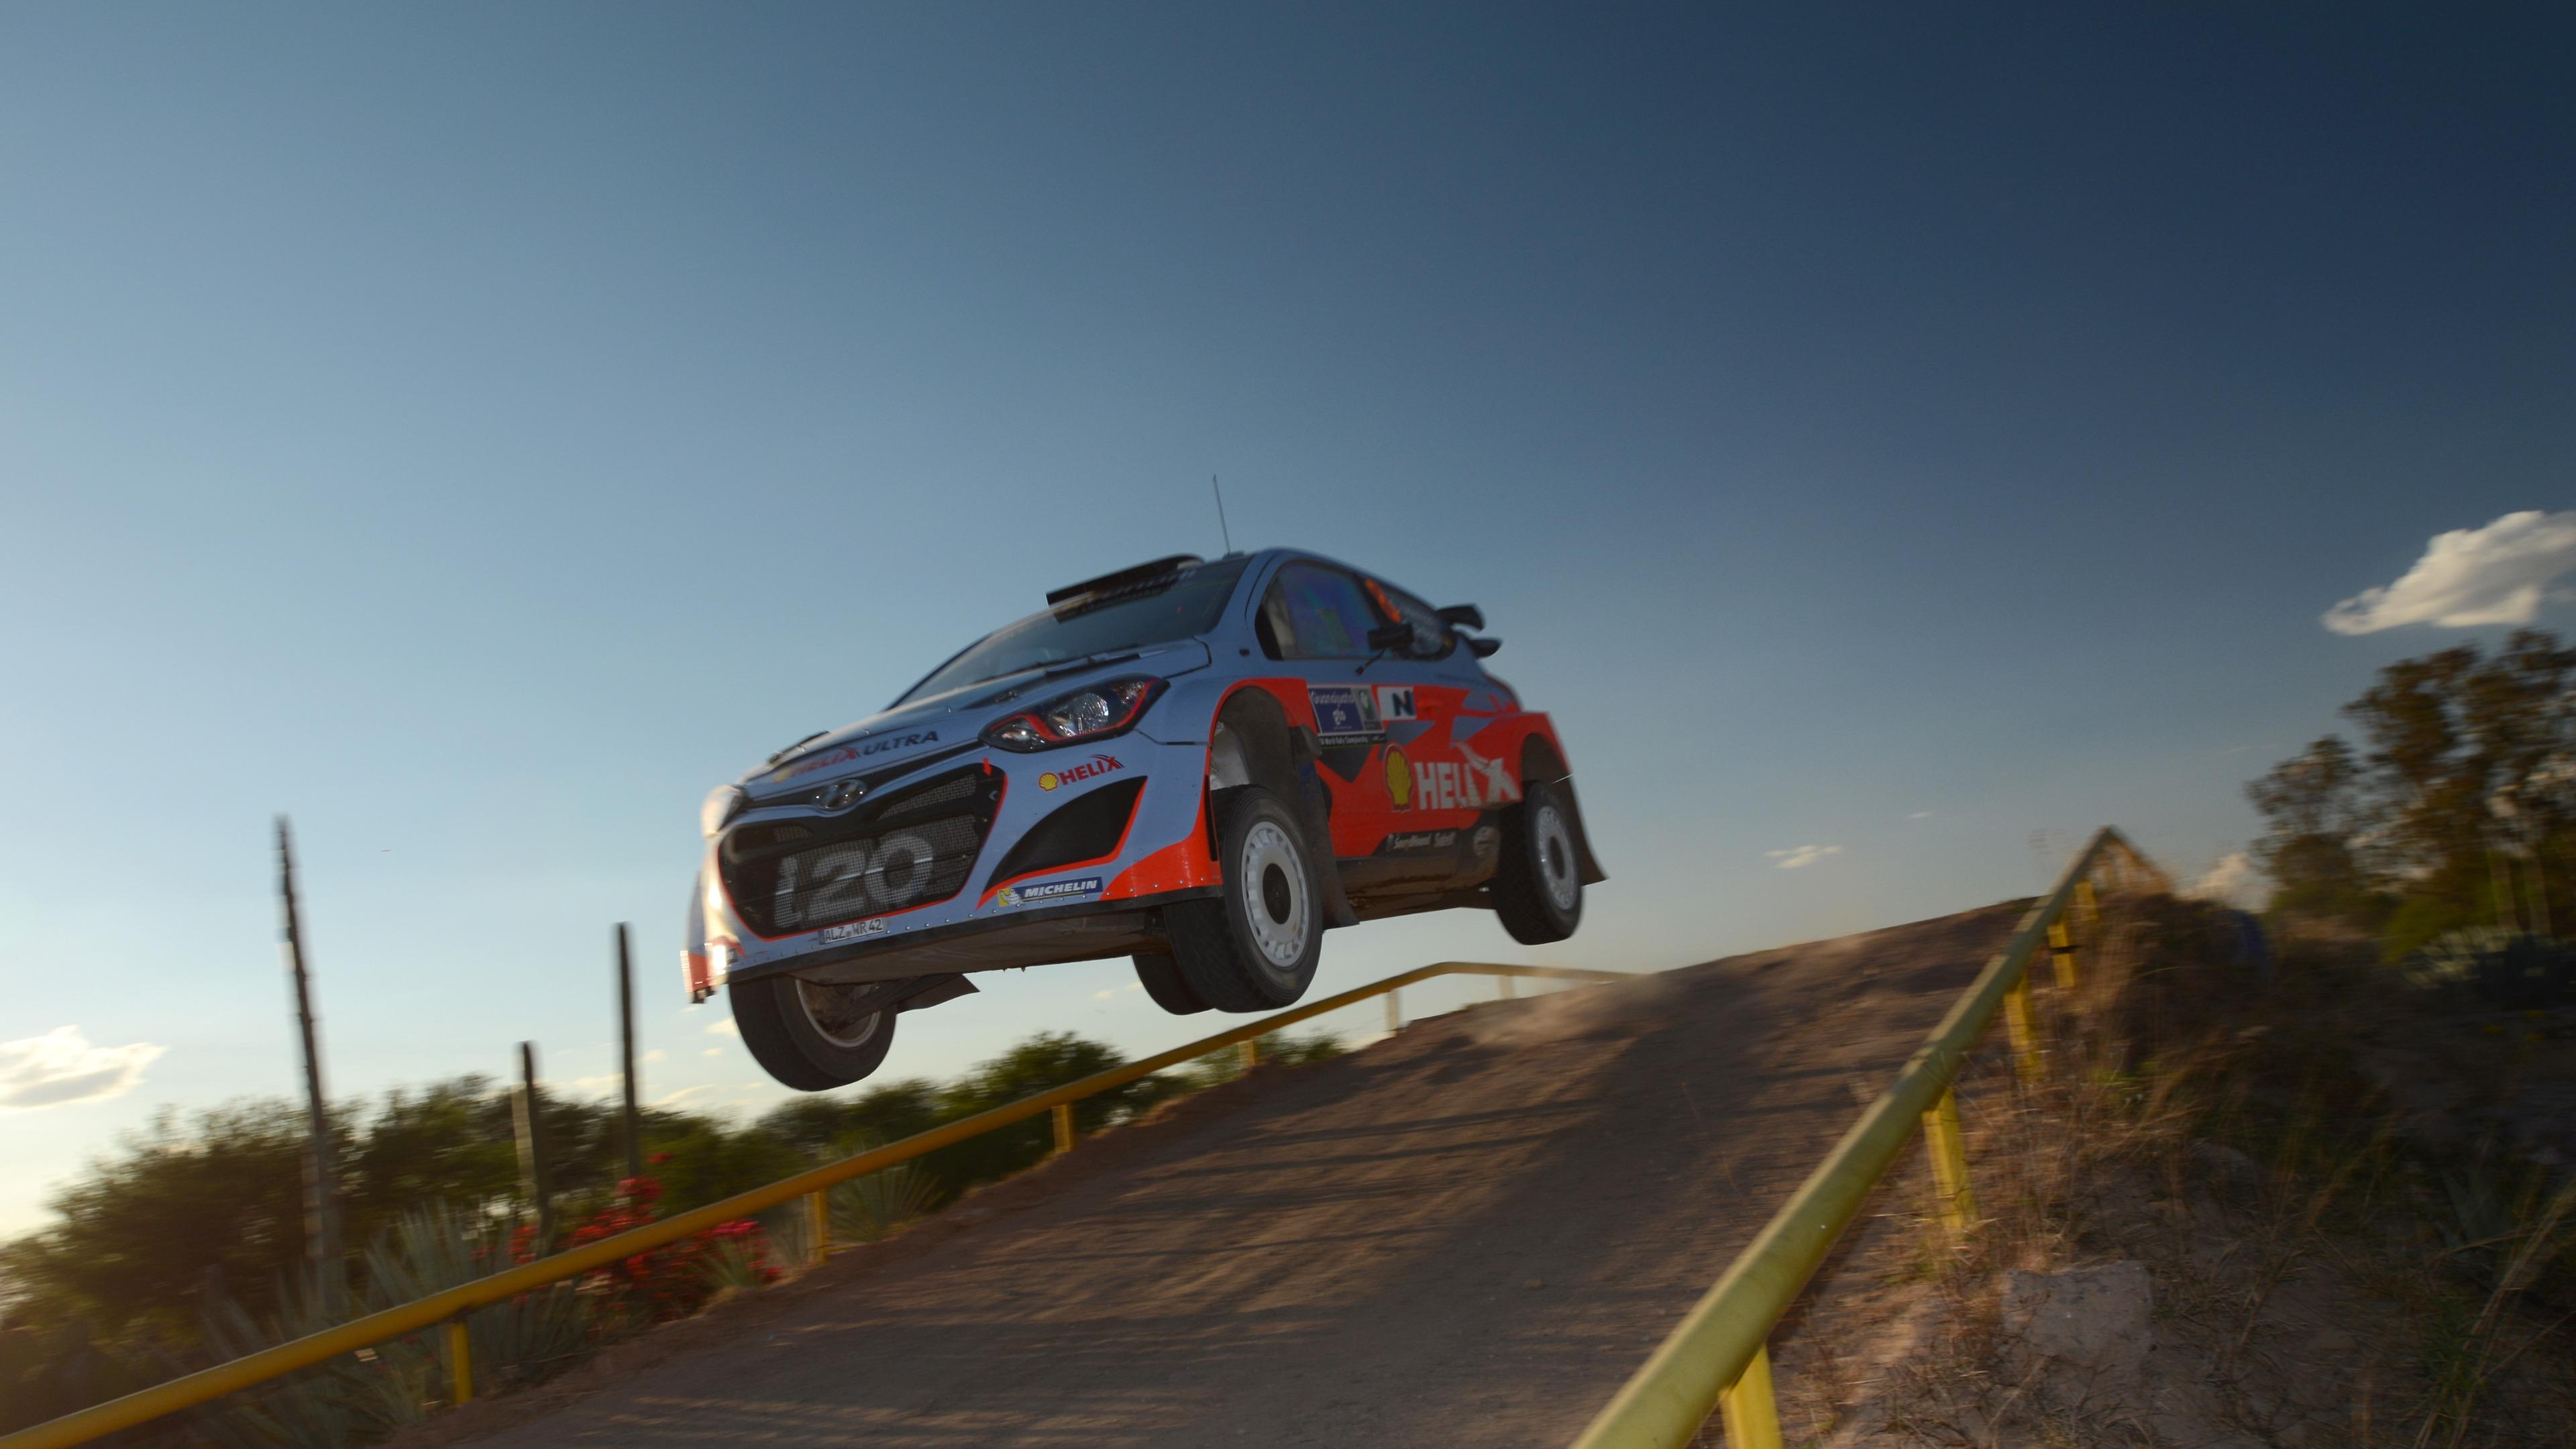 Chris Atkinson & Co-Driver Stéphane Prévot at the 2014 Rally Mexico wallpaper